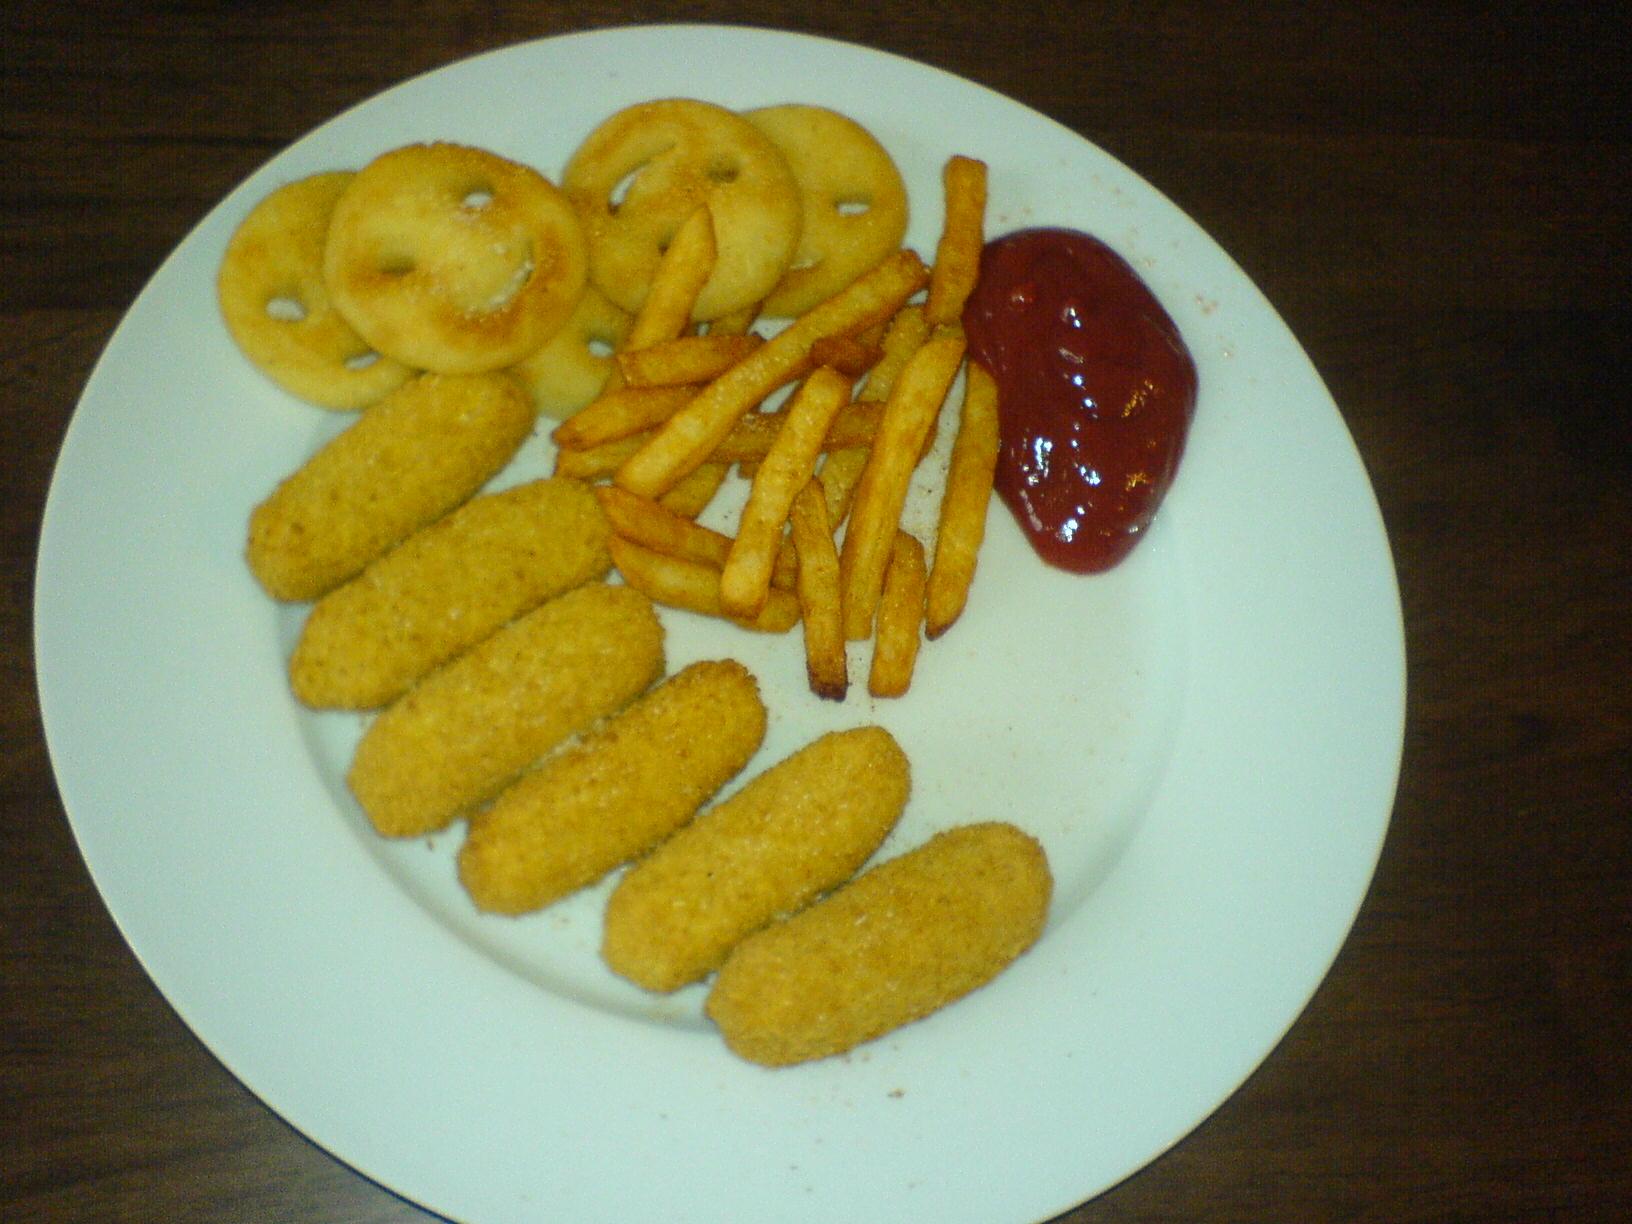 https://foodloader.net/Holz_2011-06-04_Frischkaesesticks_mit_Smiles_und_Pommes.jpg